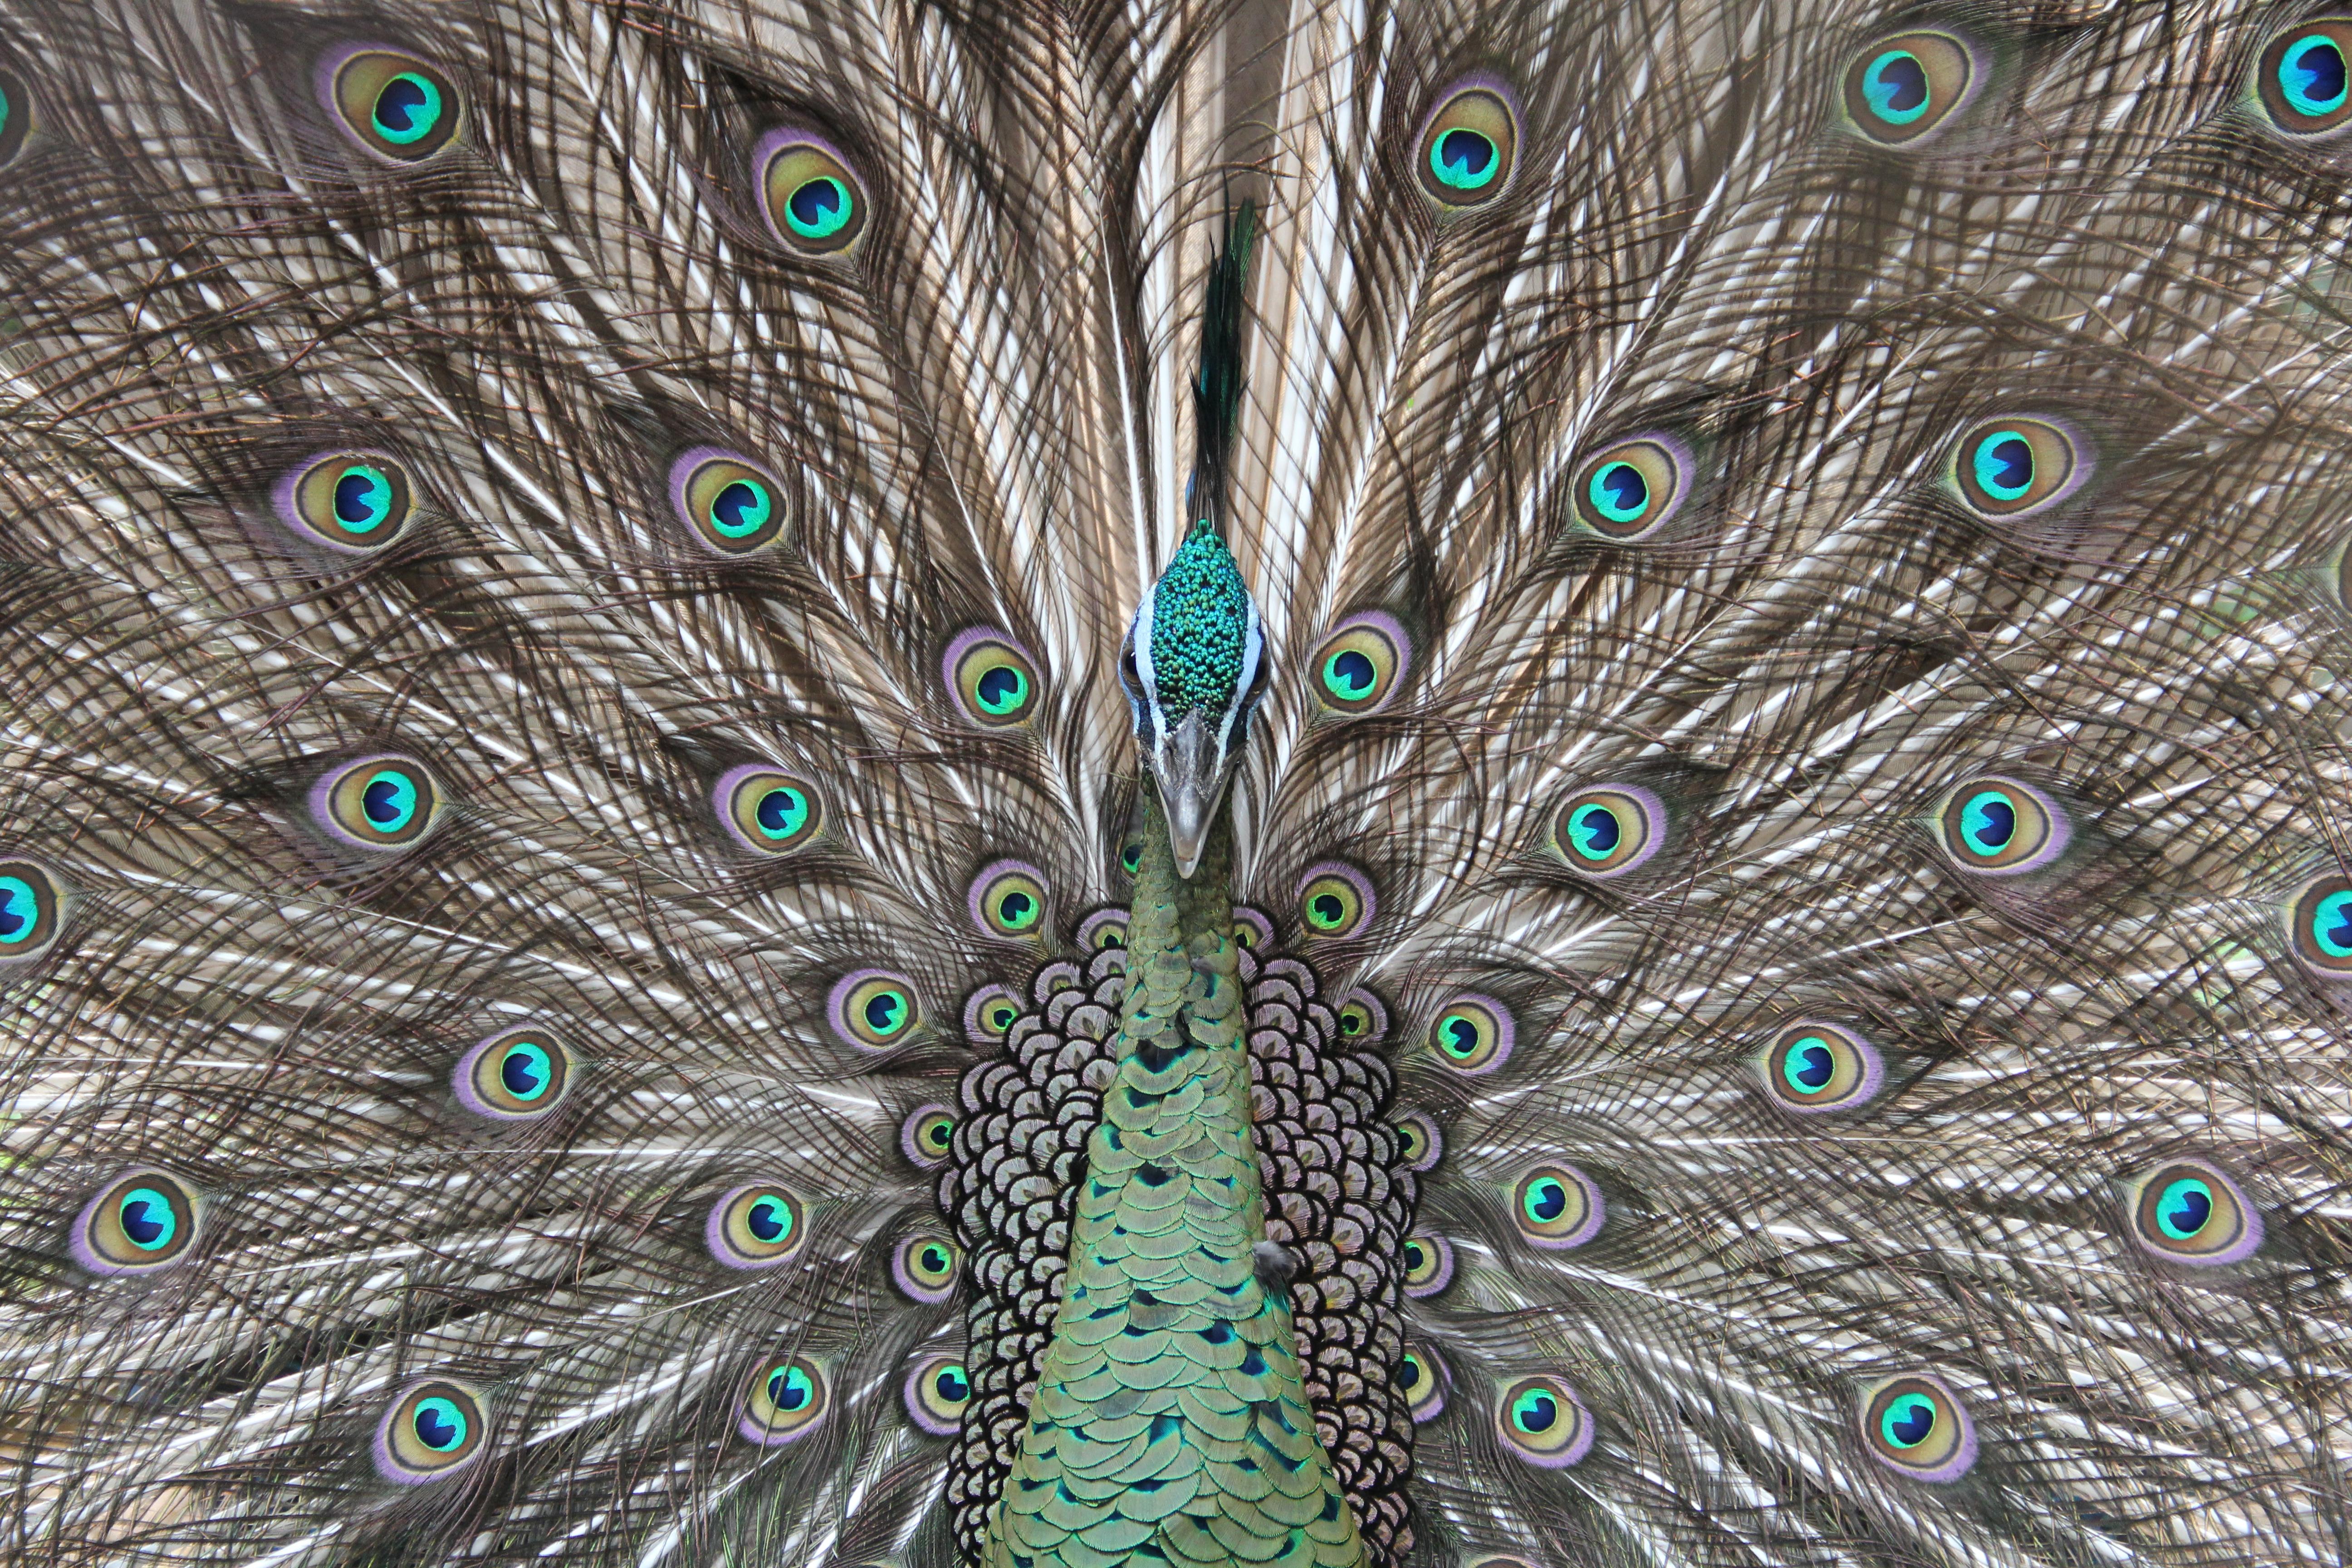 45+ Foto Gambar Burung Merak.com HD Paling Keren